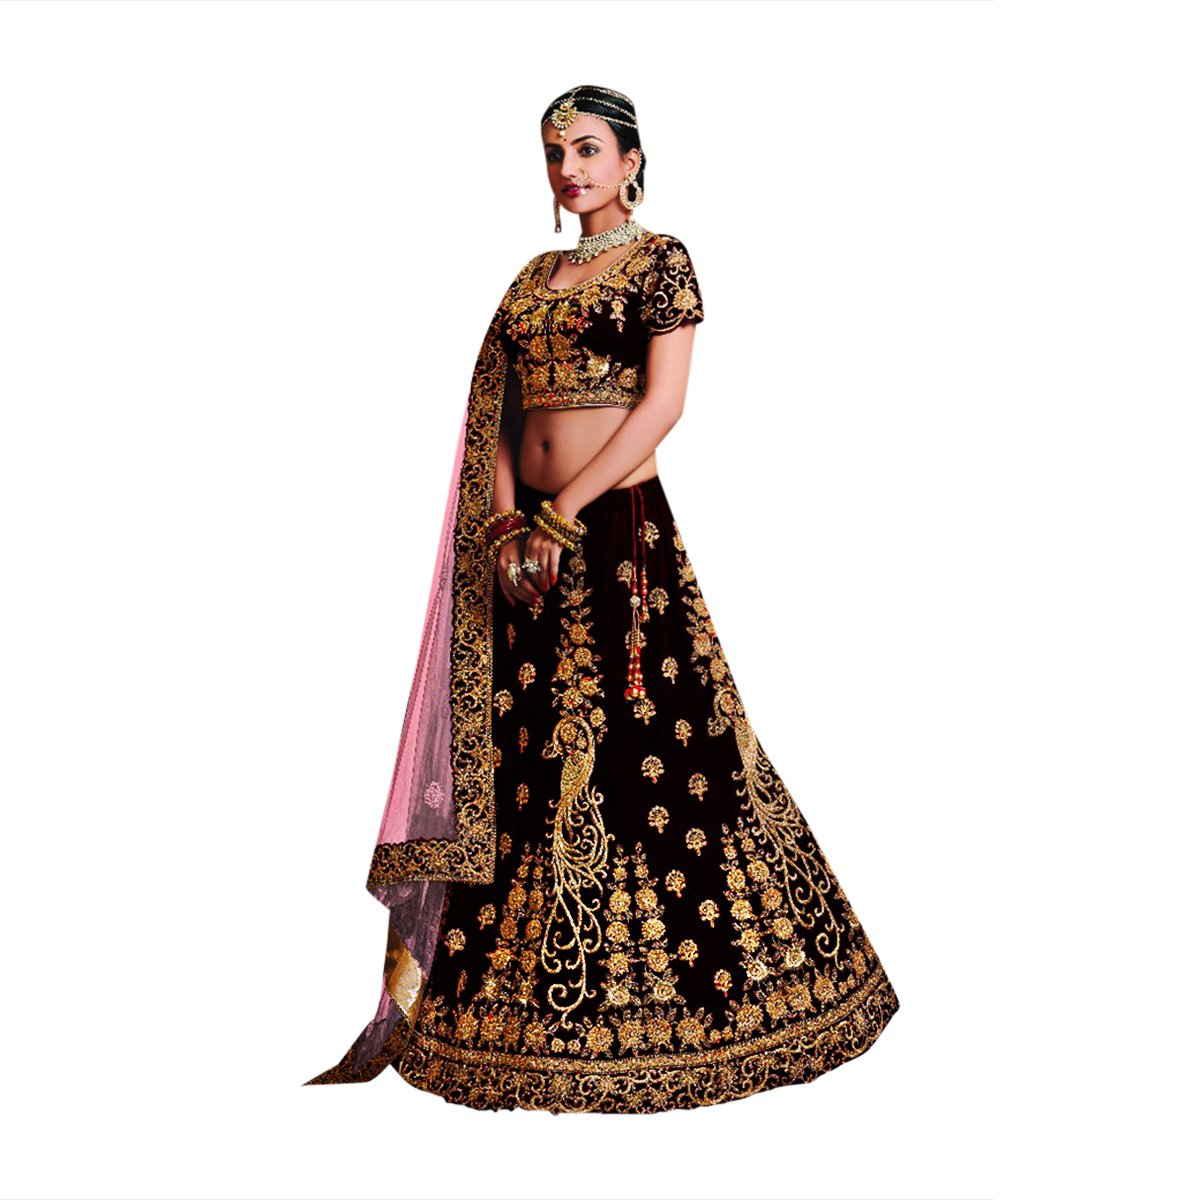 Designer Velvet Lehenga Choli Dupatta Dress Bollywood Indian Ethnic Wedding Women Muslim Bridal Embroidery Zari Work 645 (Wine & Pink) by ETHNIC EMPORIUM